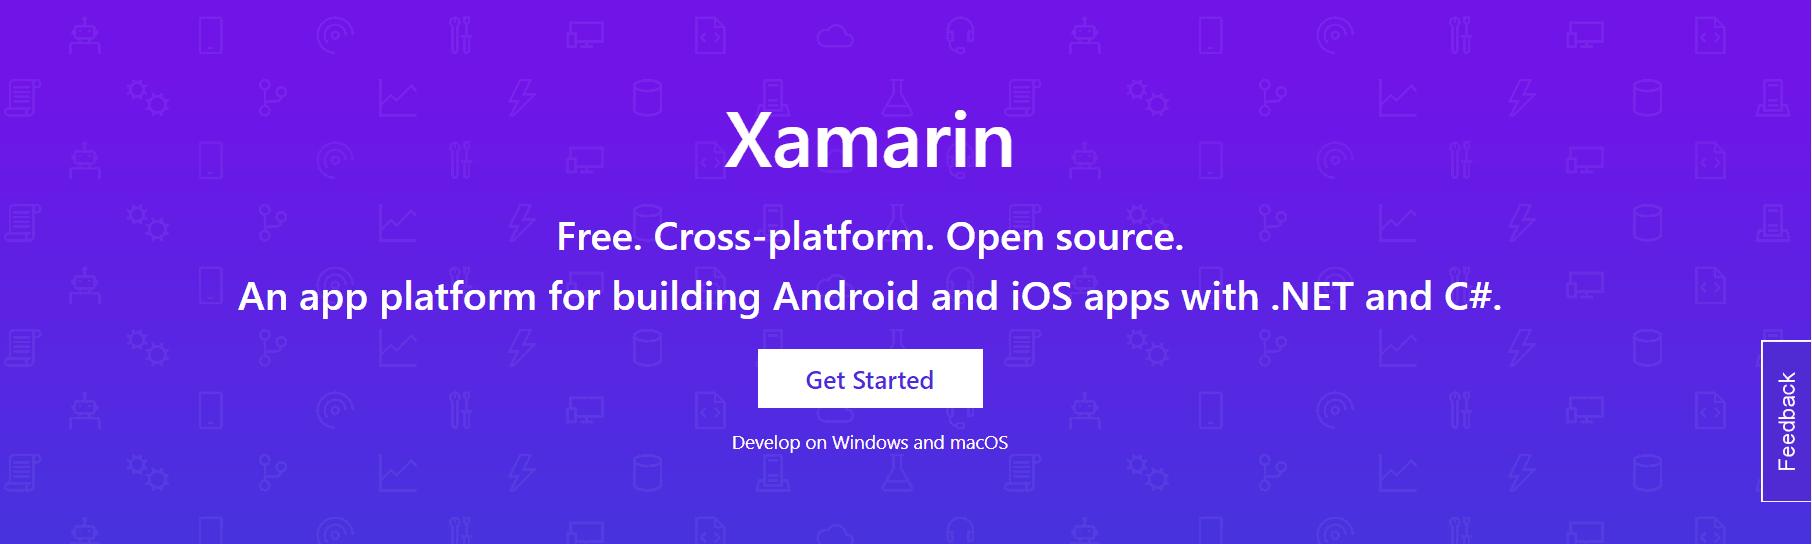 creare app cross-platform - xamarin